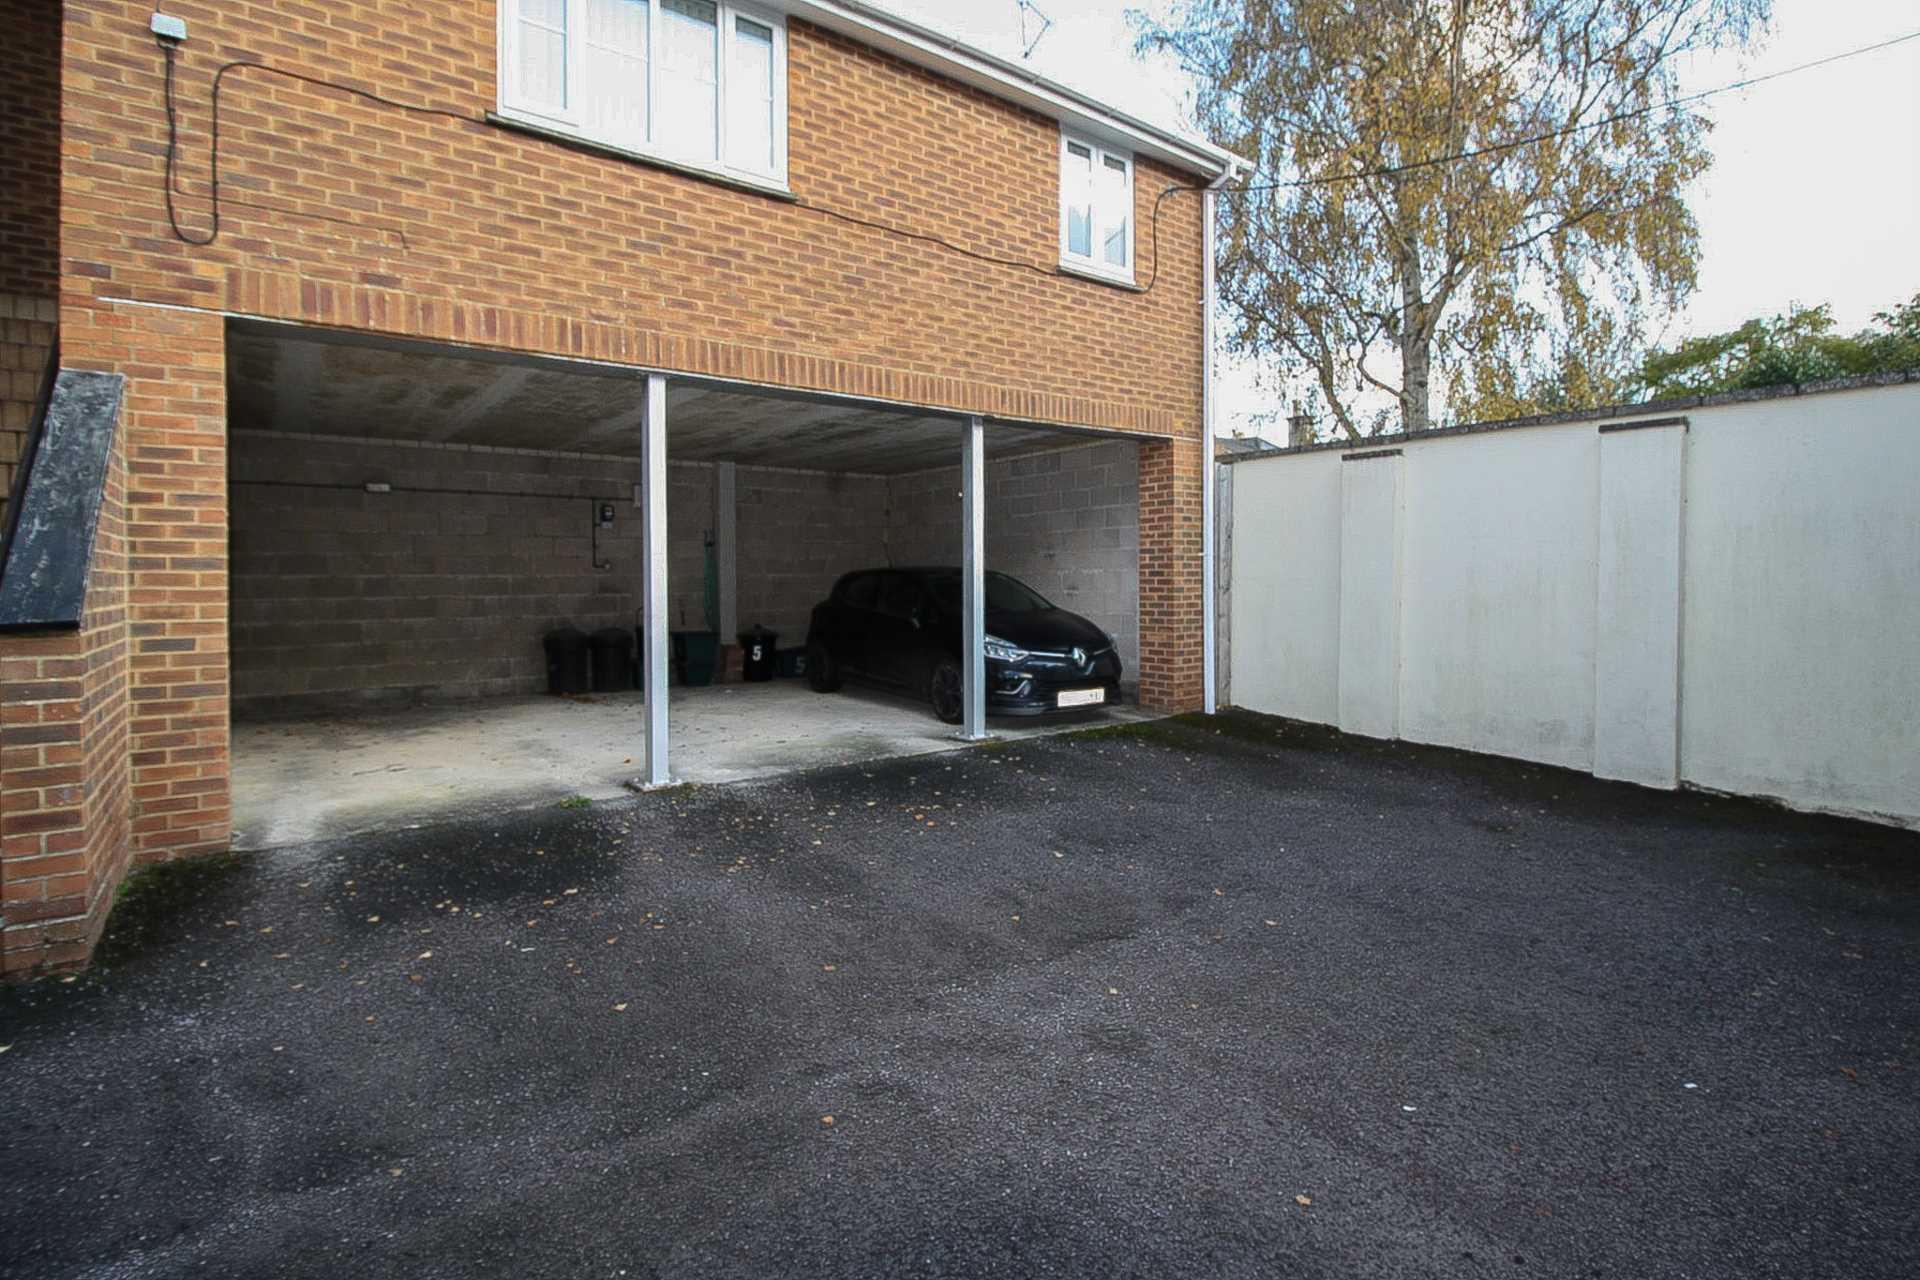 2 bed flat for sale in Dorset Mews, Dorset Street, Blandford Forum  - Property Image 6